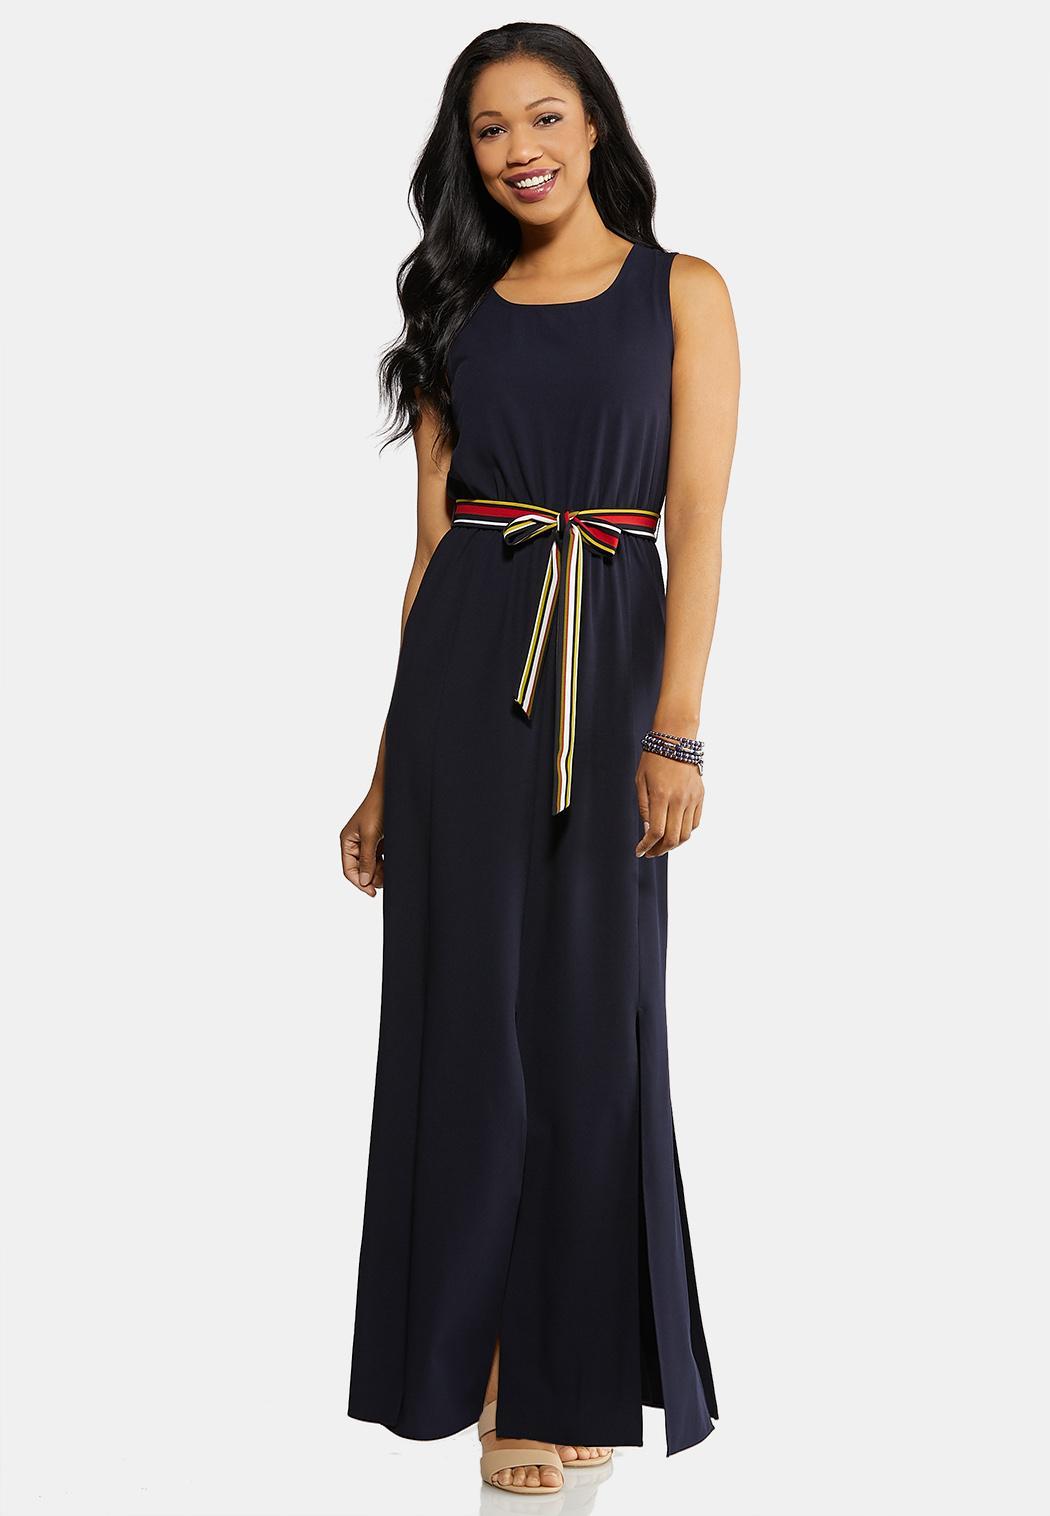 Petite Nautical Navy Belted Maxi Dress